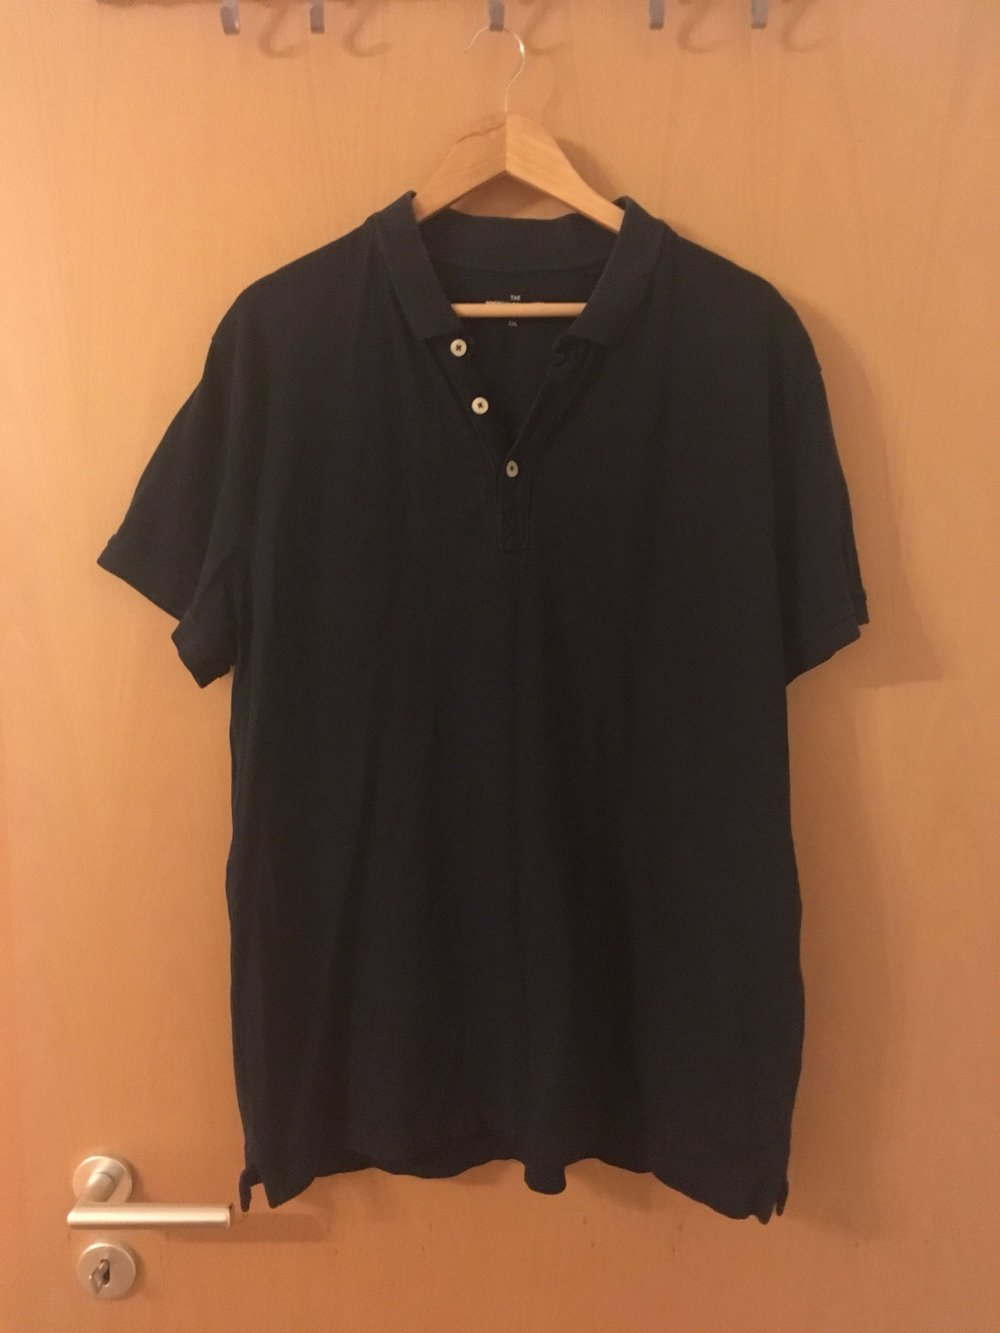 b02793f60c7ed0 C&A - Dunkelblaues Polo Shirt für Männer :: Kleiderkorb.de